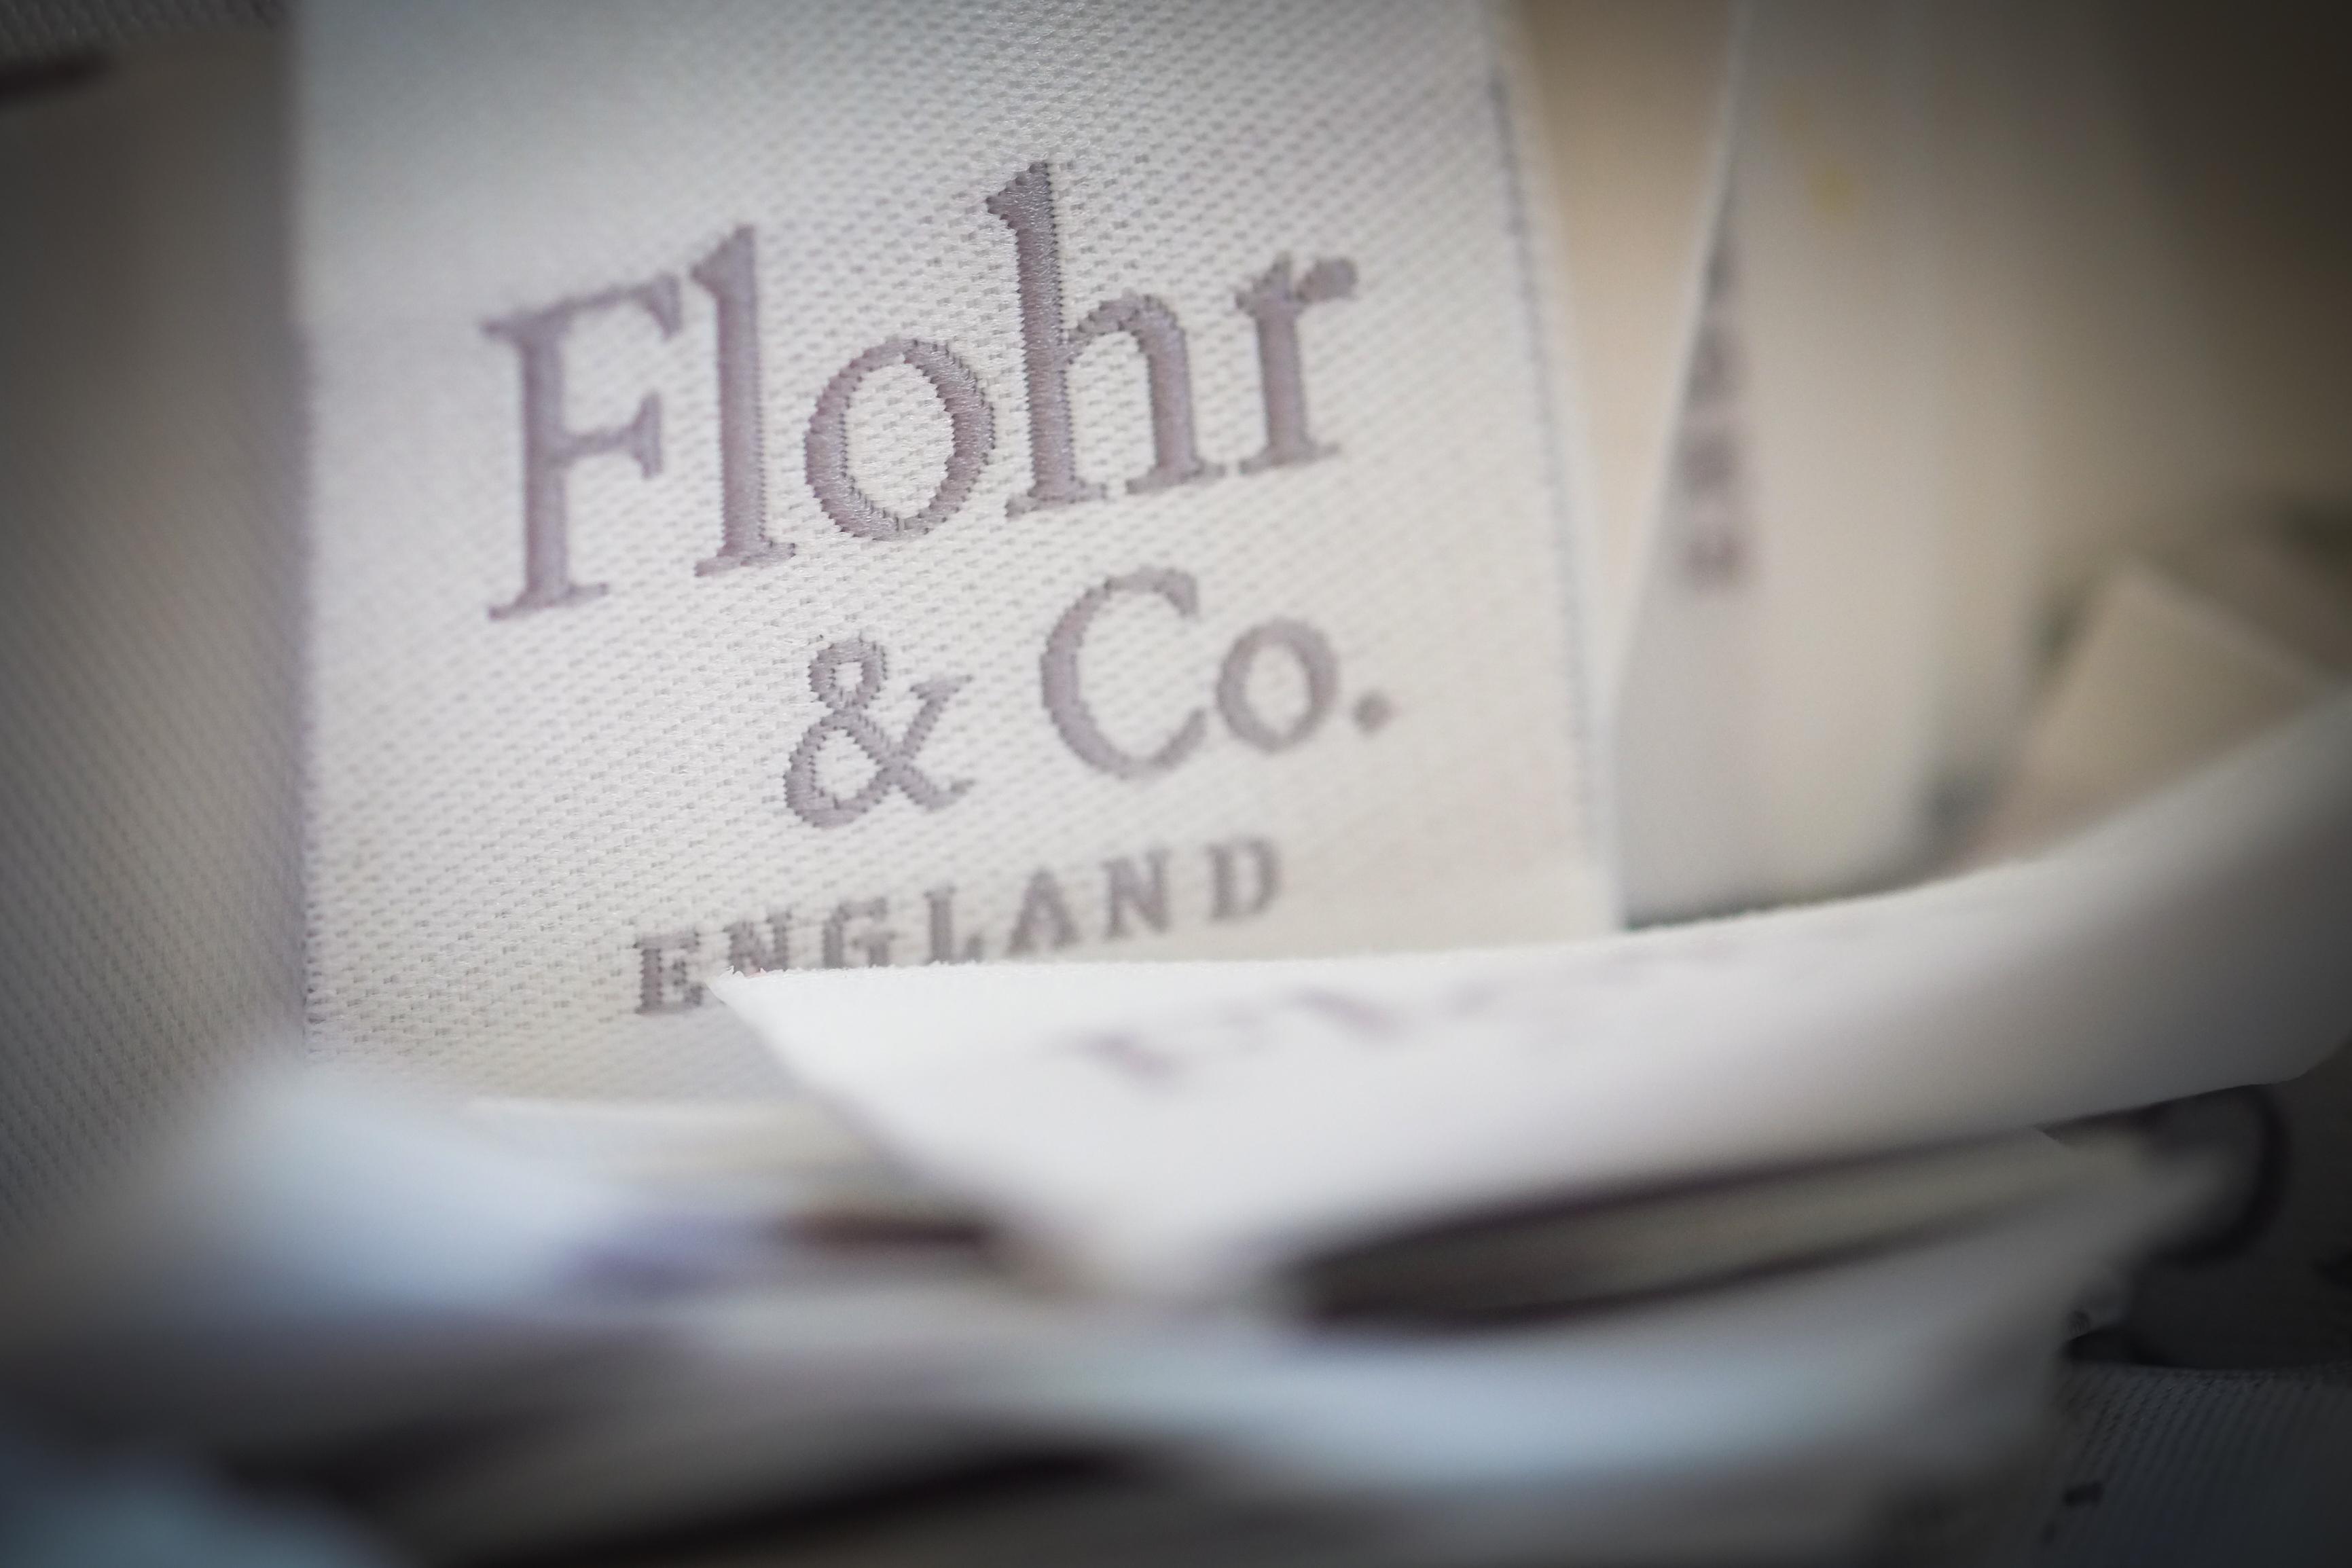 flohr & co august 2015-5